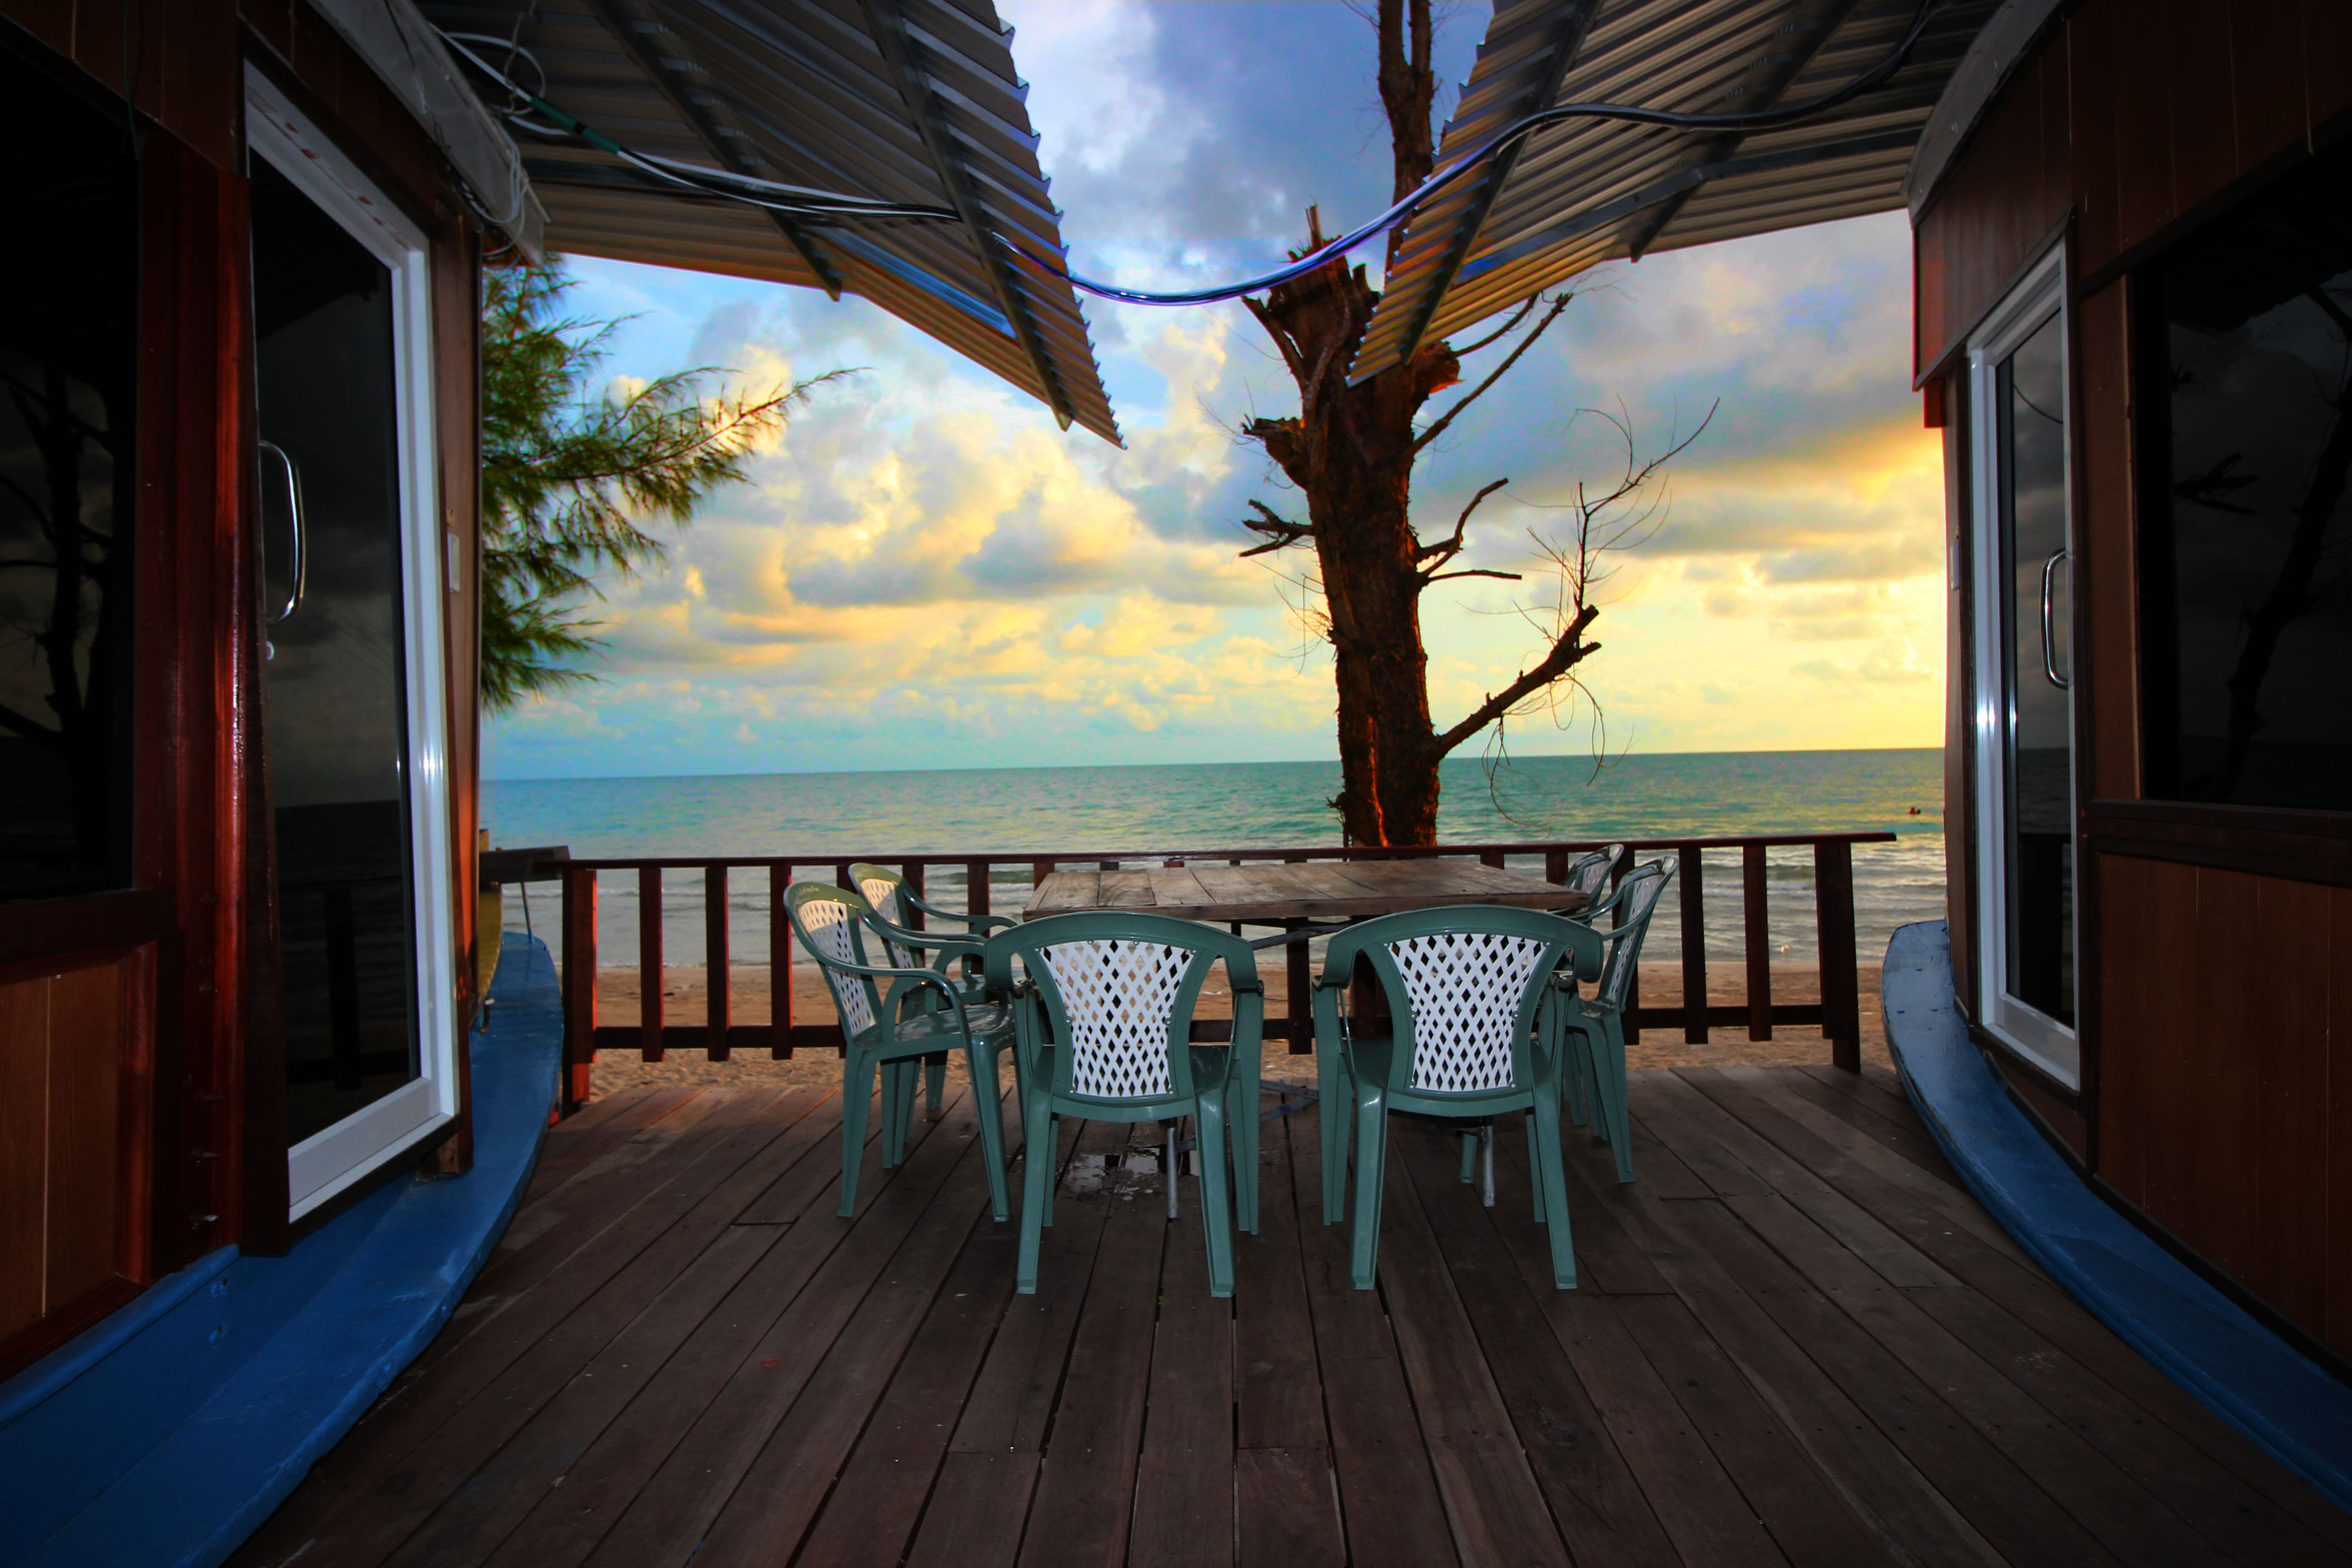 Boat hotel3